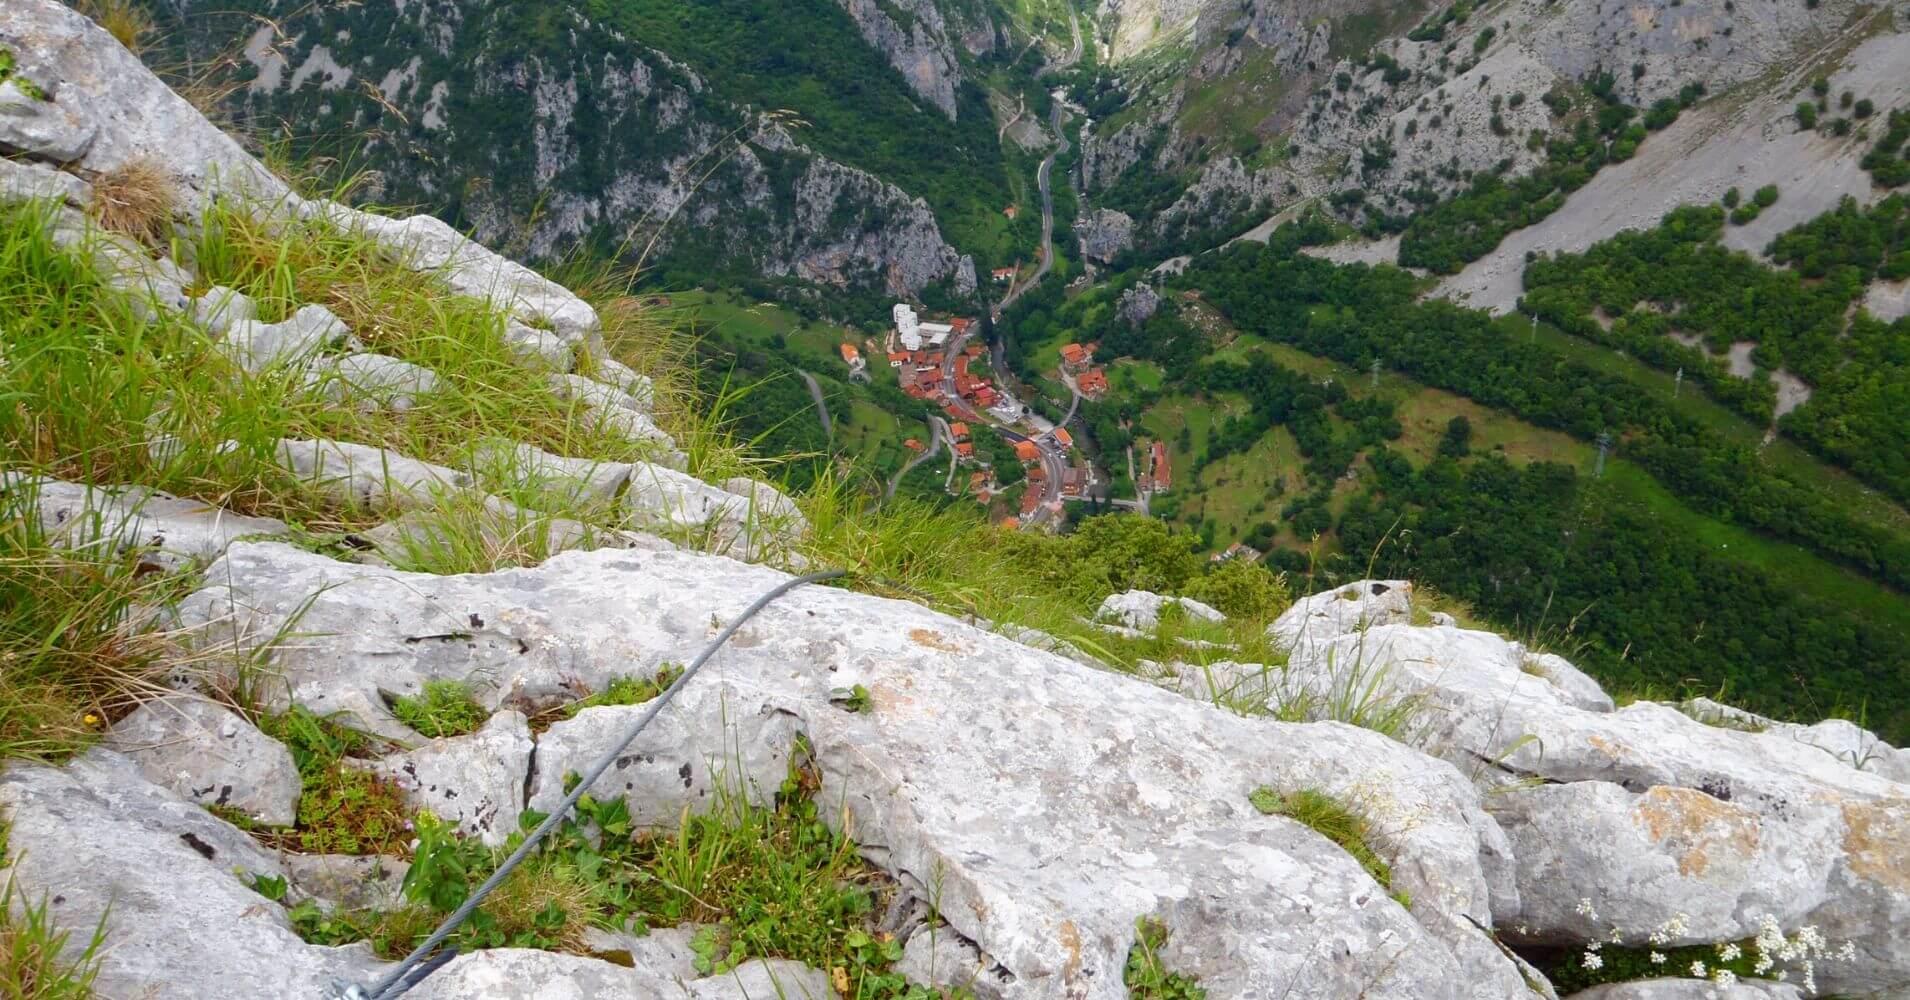 Integral de la Vía. Picos de Europa, Cantabria.